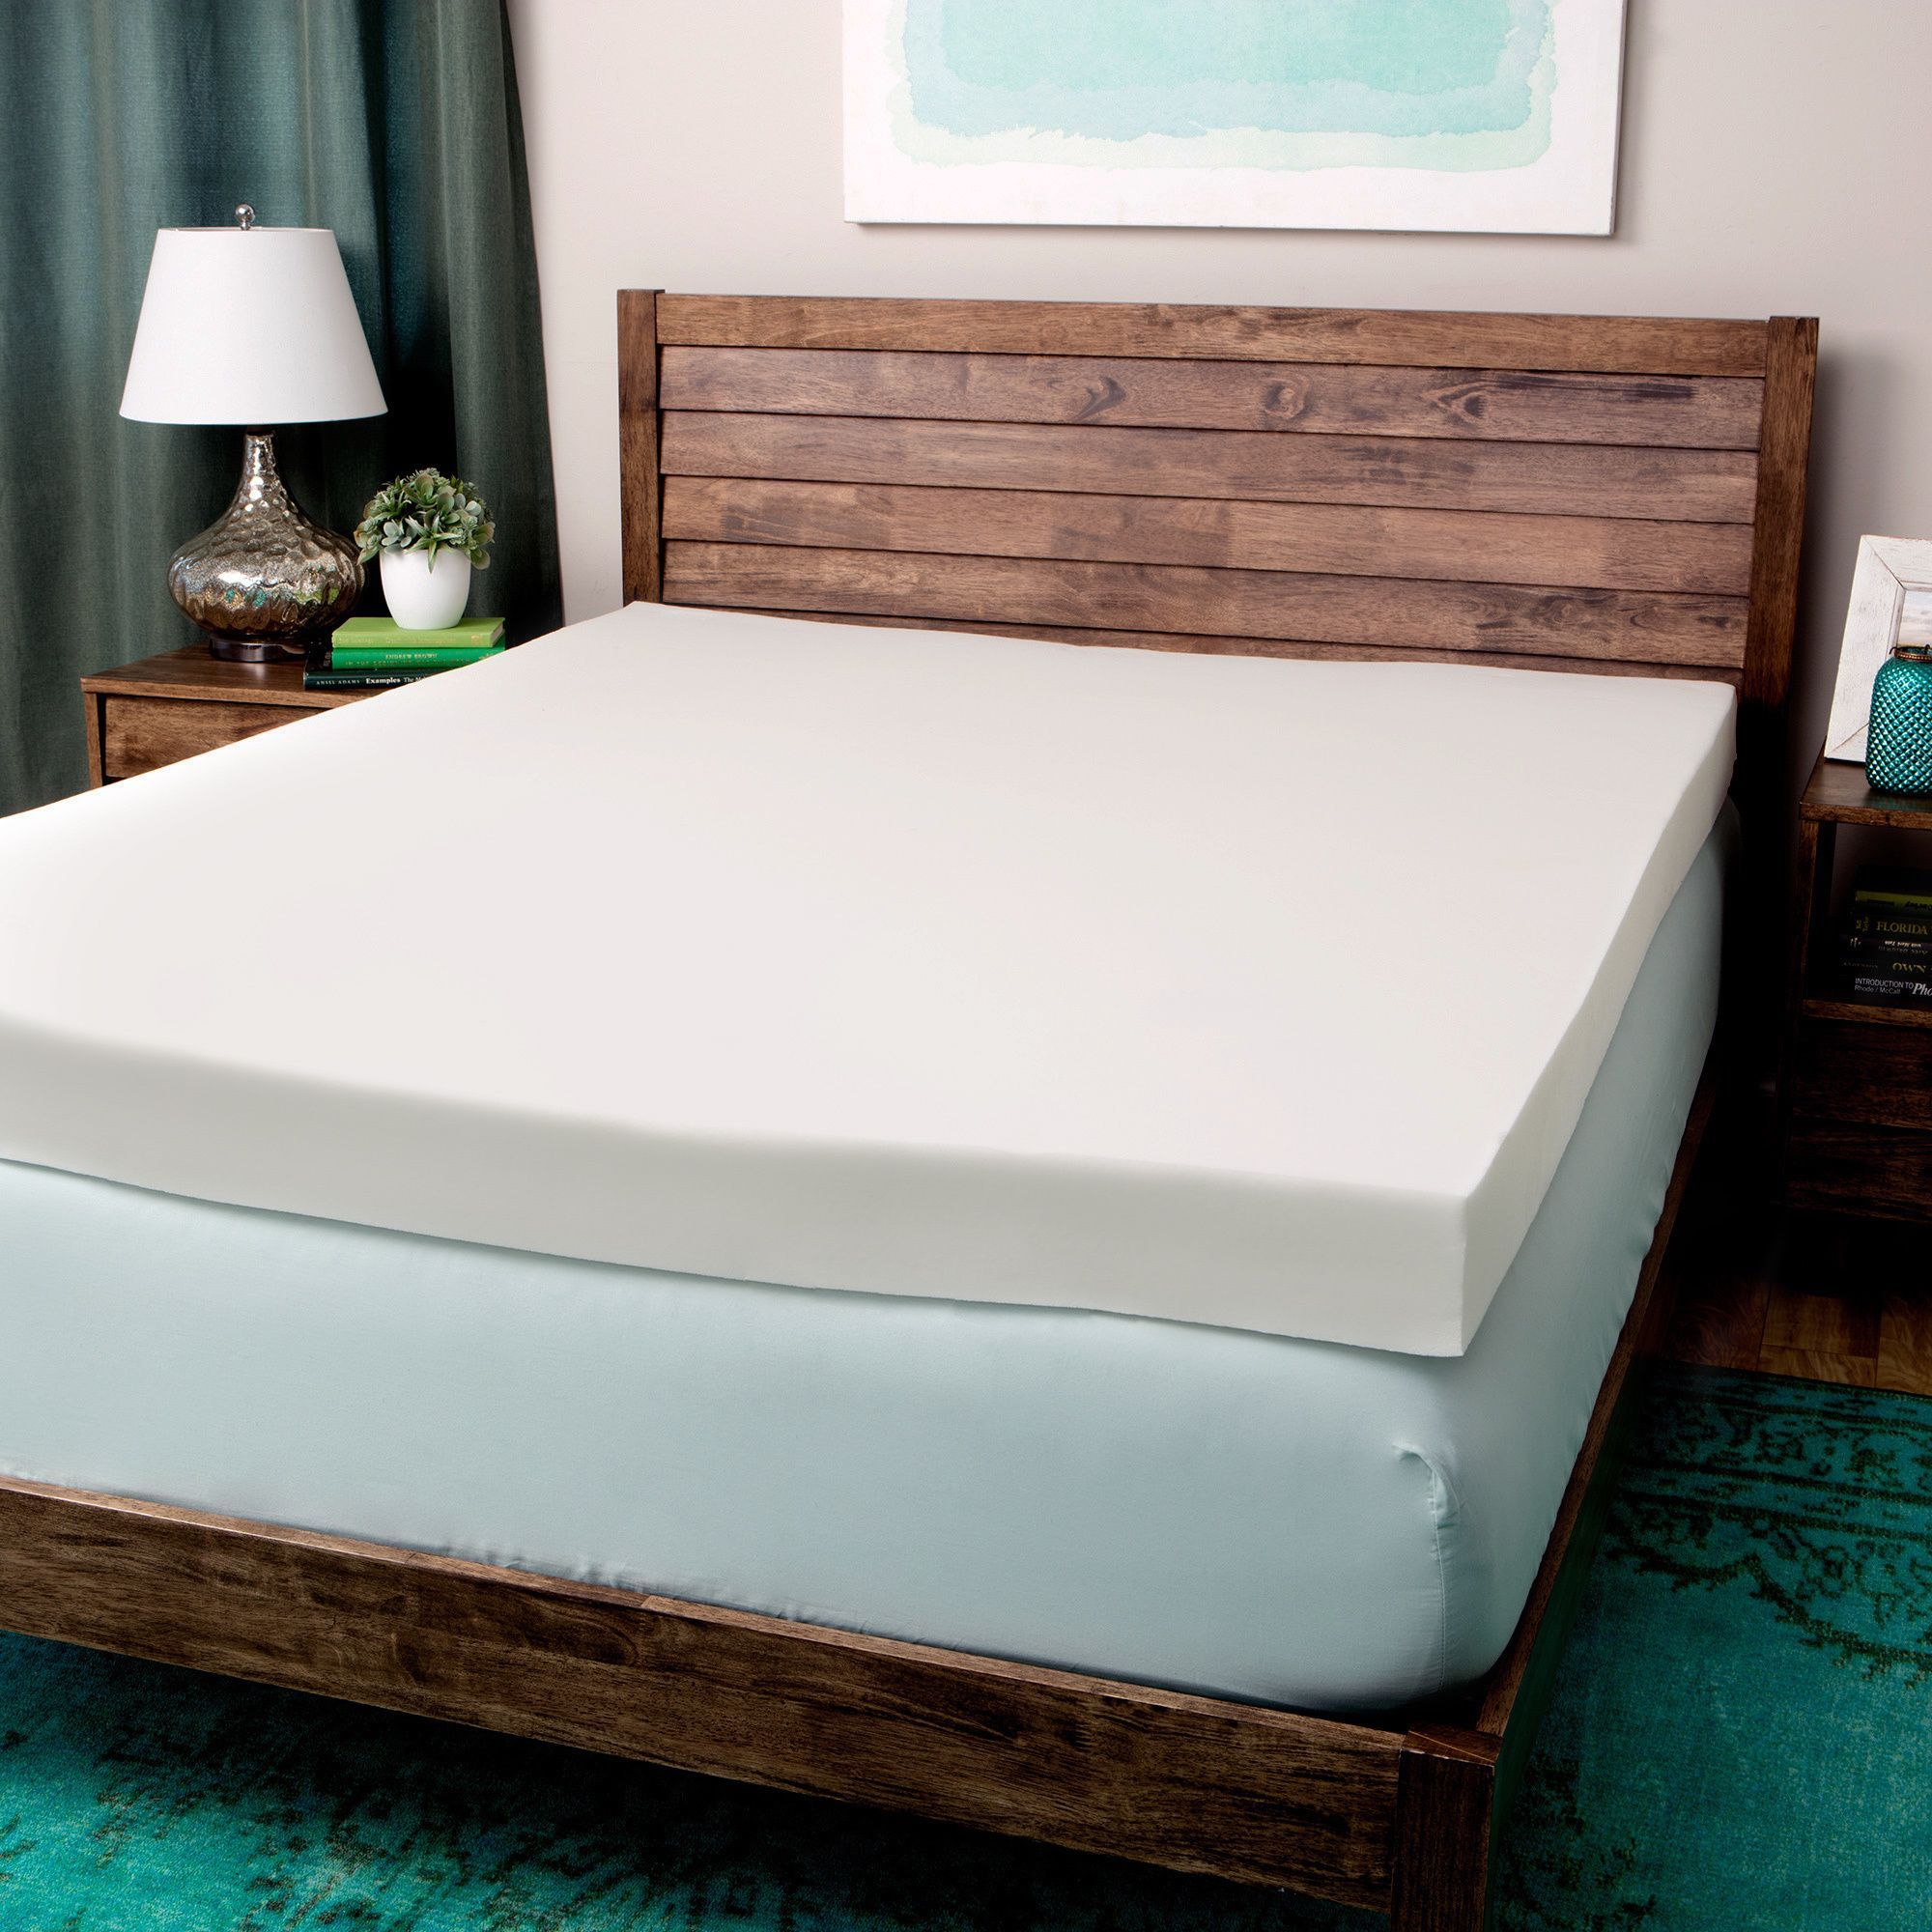 Comfort Dreams 4 inch Memory Foam Mattress Toppers Bed Topper Memoryfoam Pad